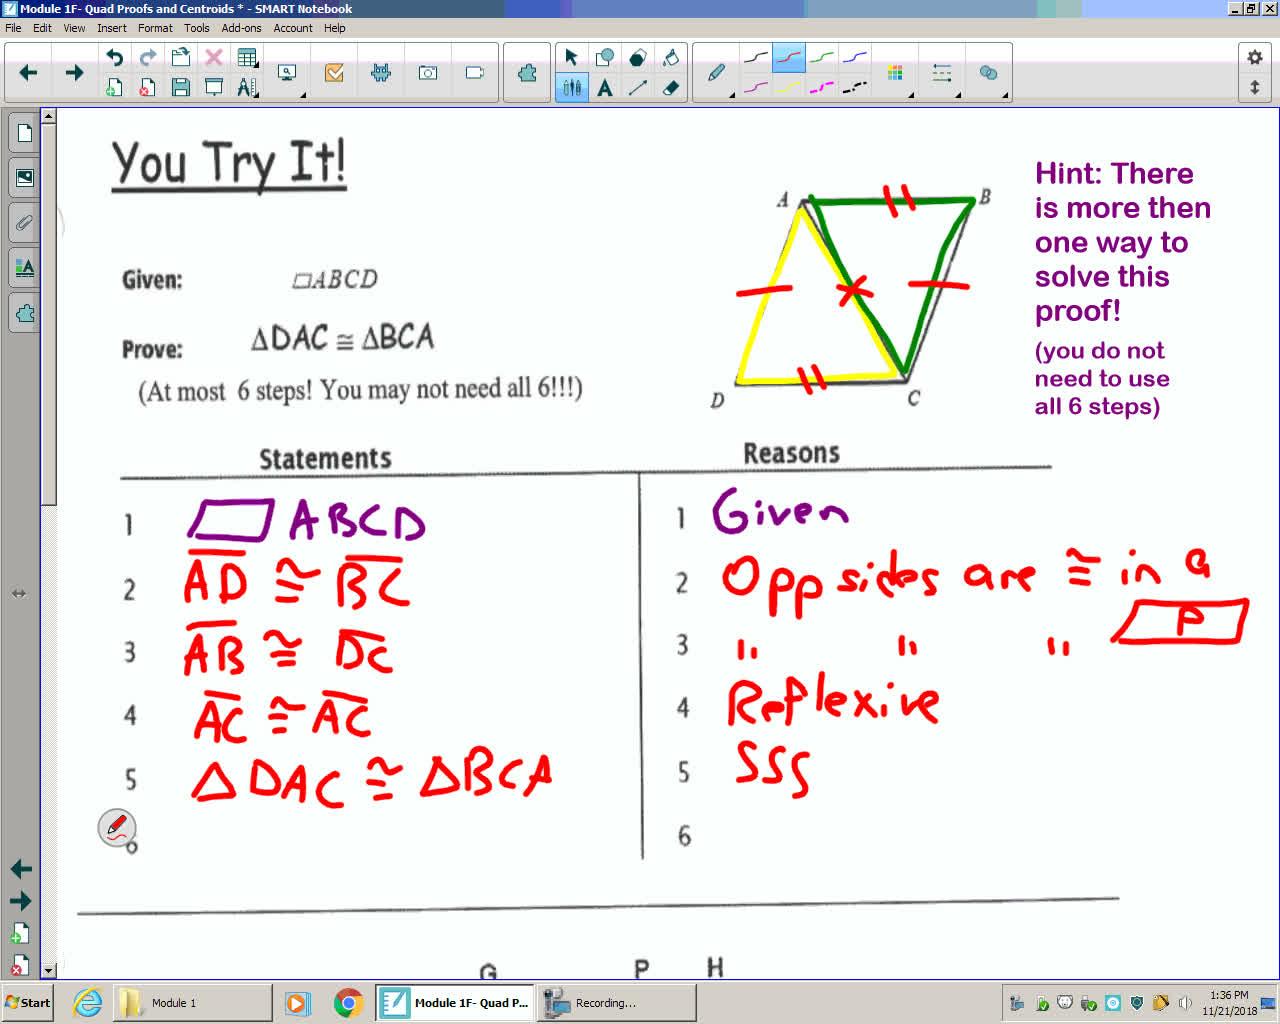 Mod 1F Unit 3B Lesson 1